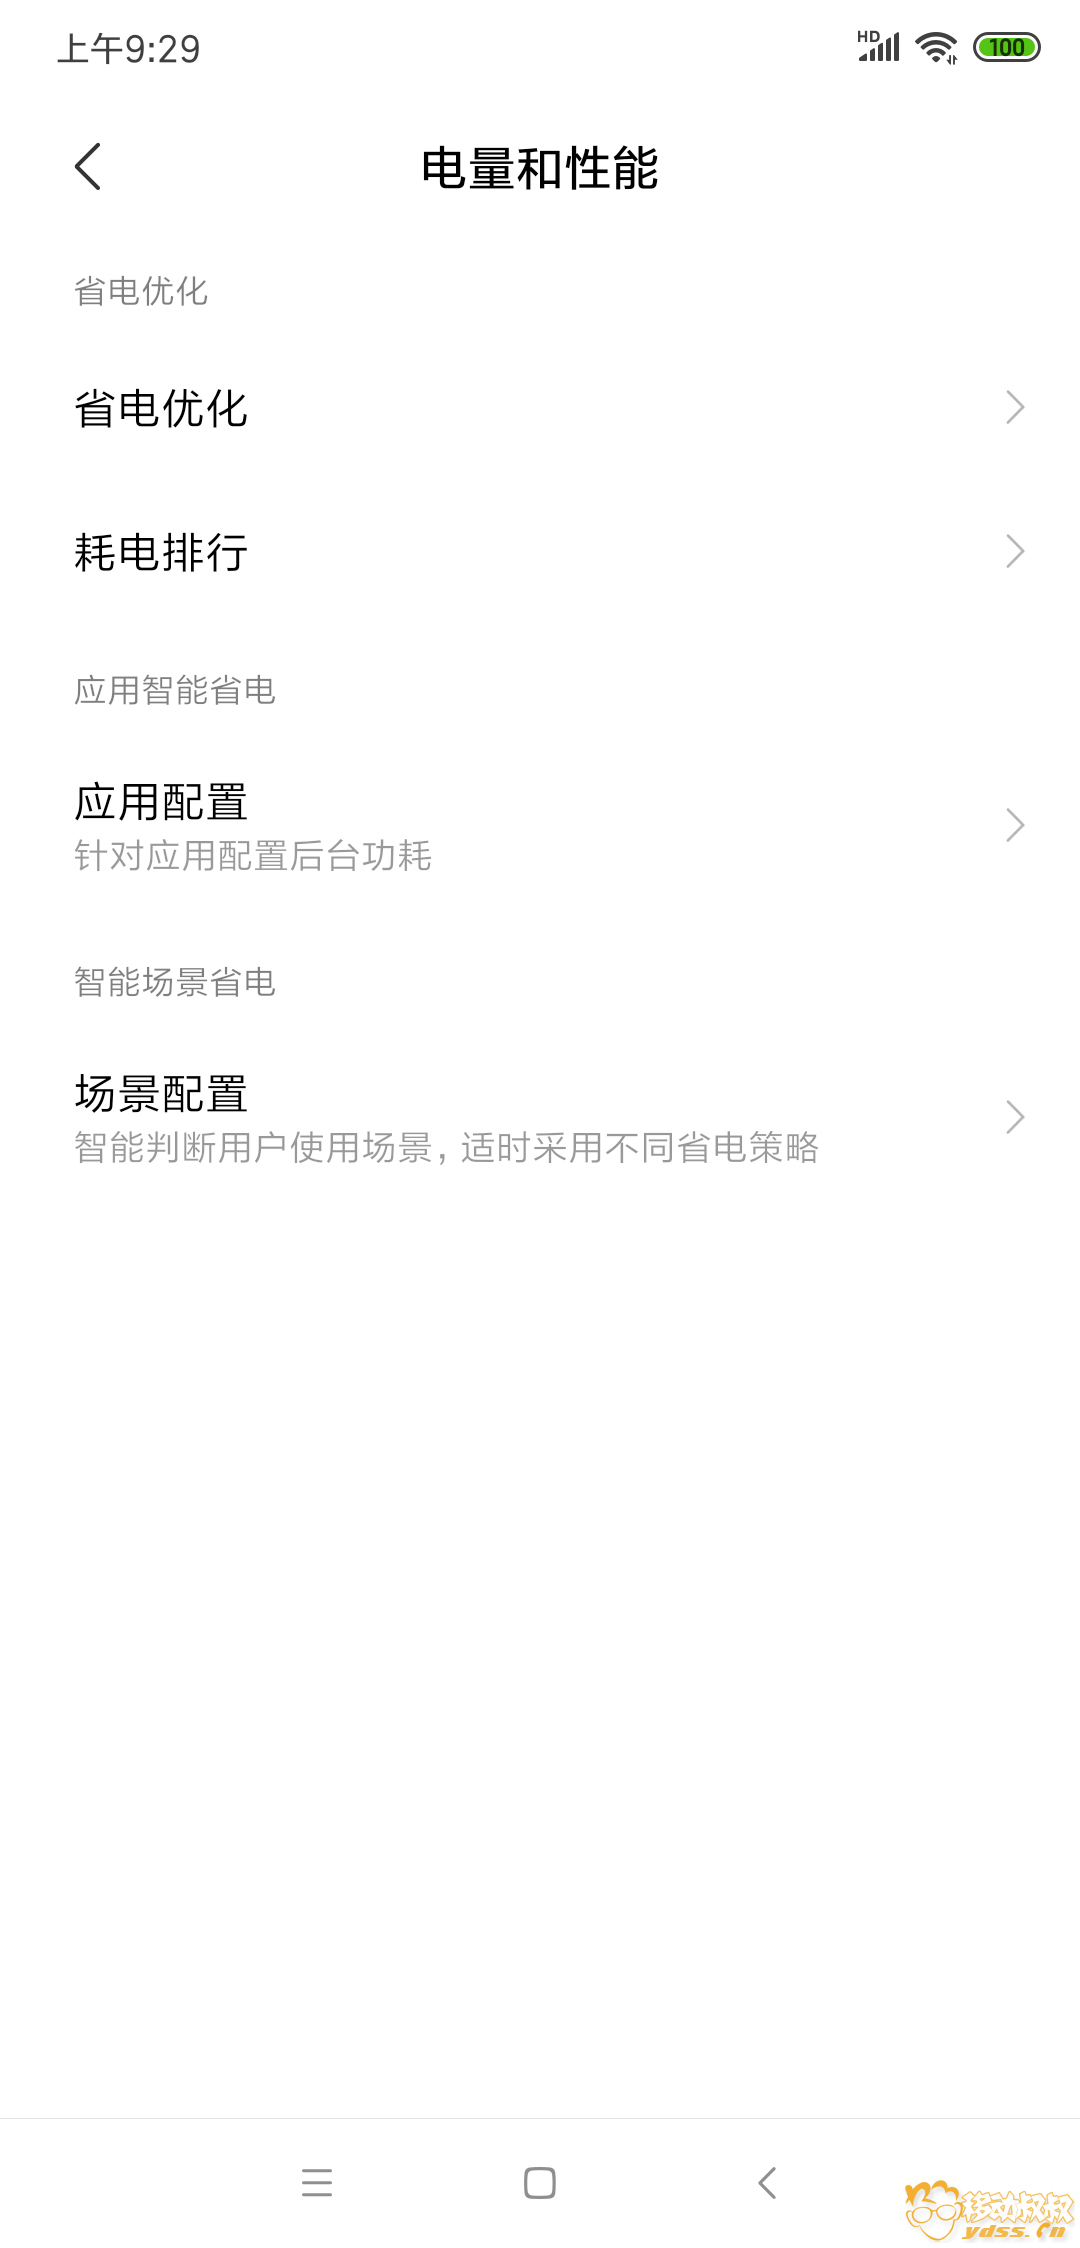 Screenshot_2019-10-05-09-29-22-430_com.miui.powerkeeper.png